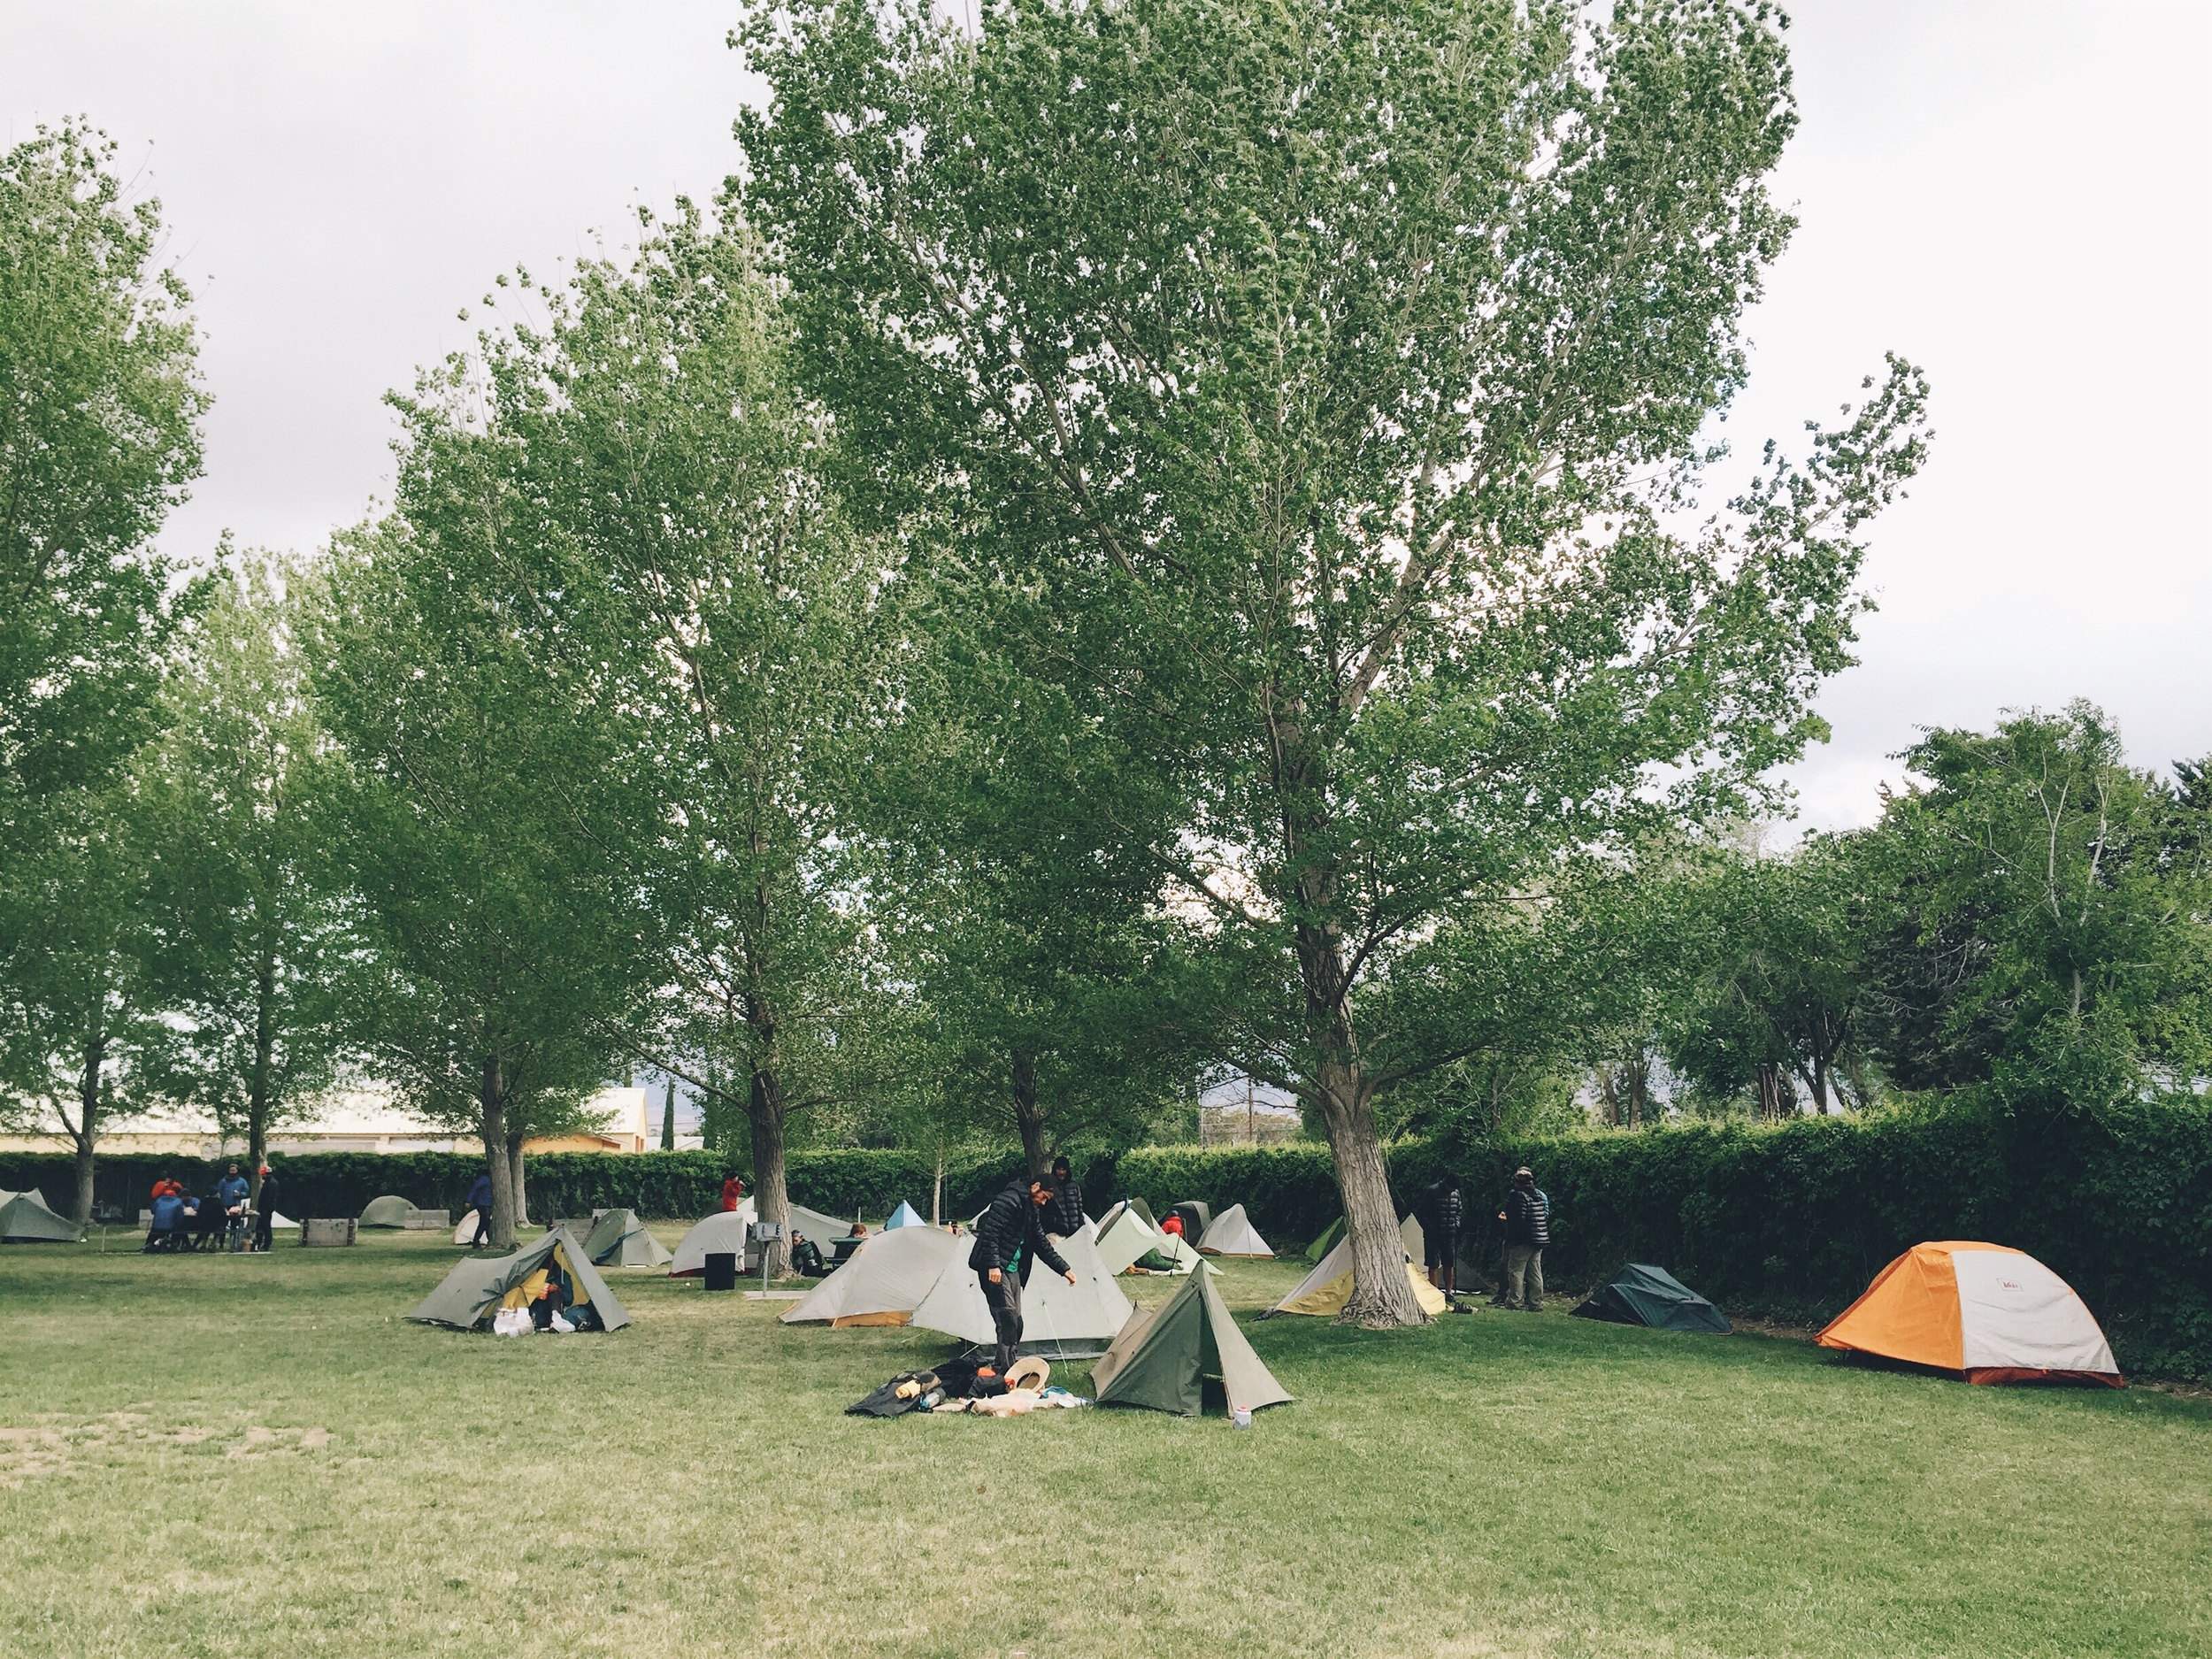 So many tents here.